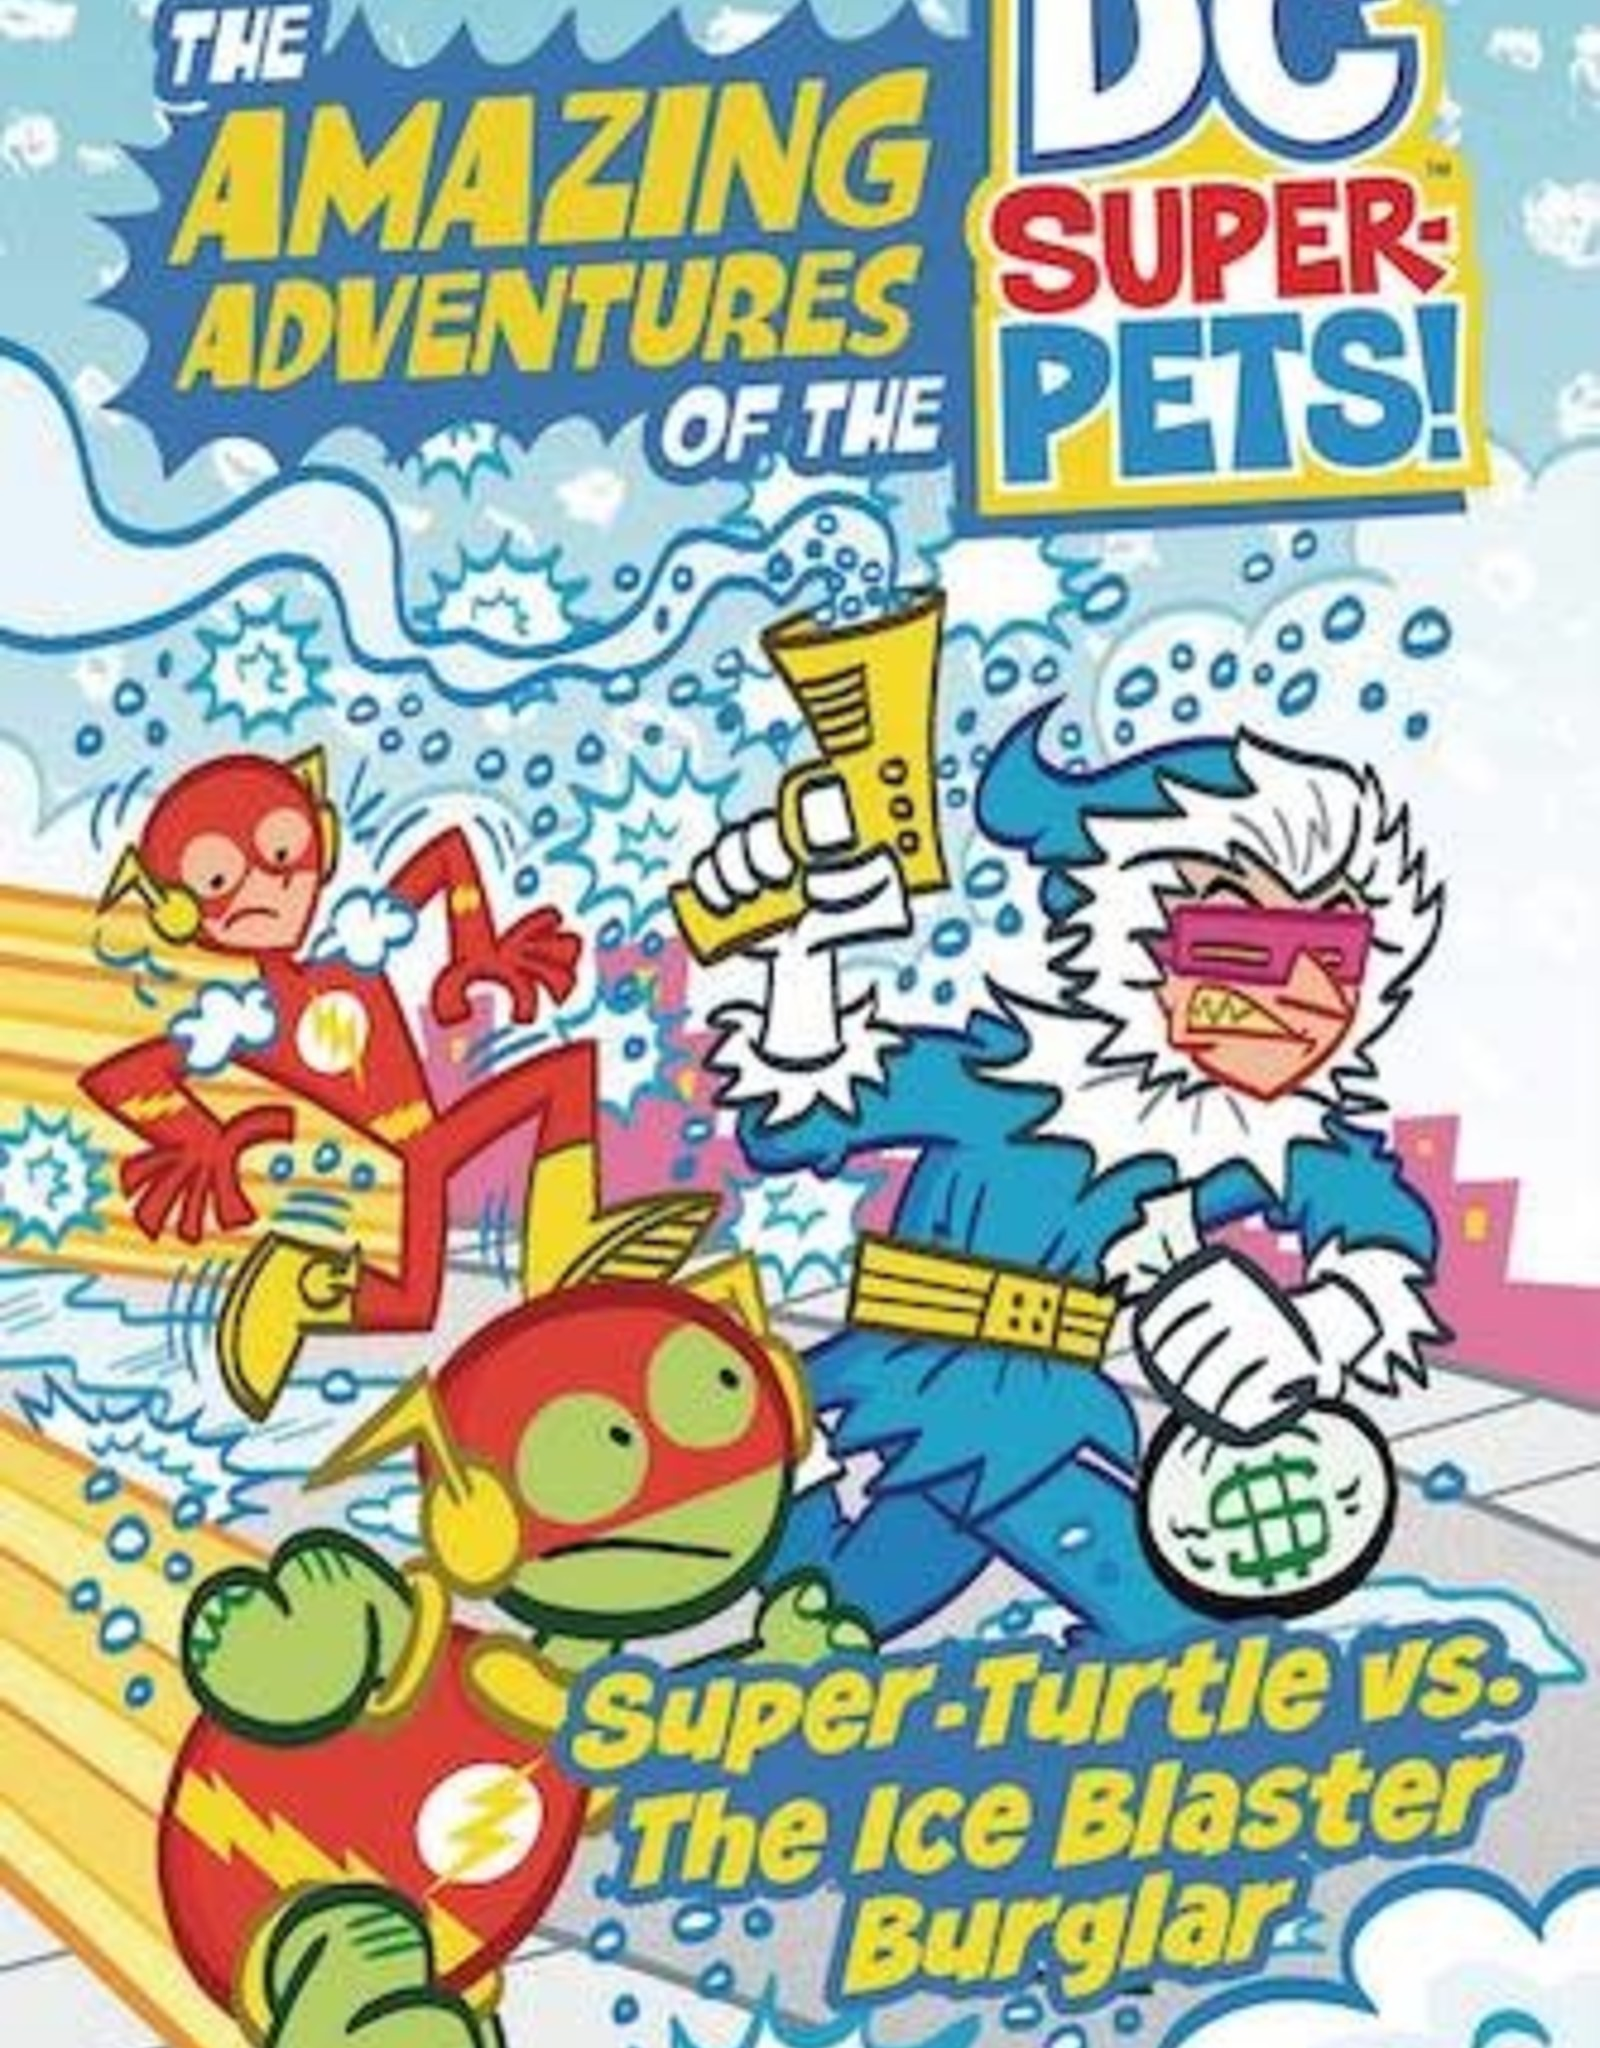 Capstone - Picture Window Book DC Super Pets Whatzit Vs Ice Blaster Burglar